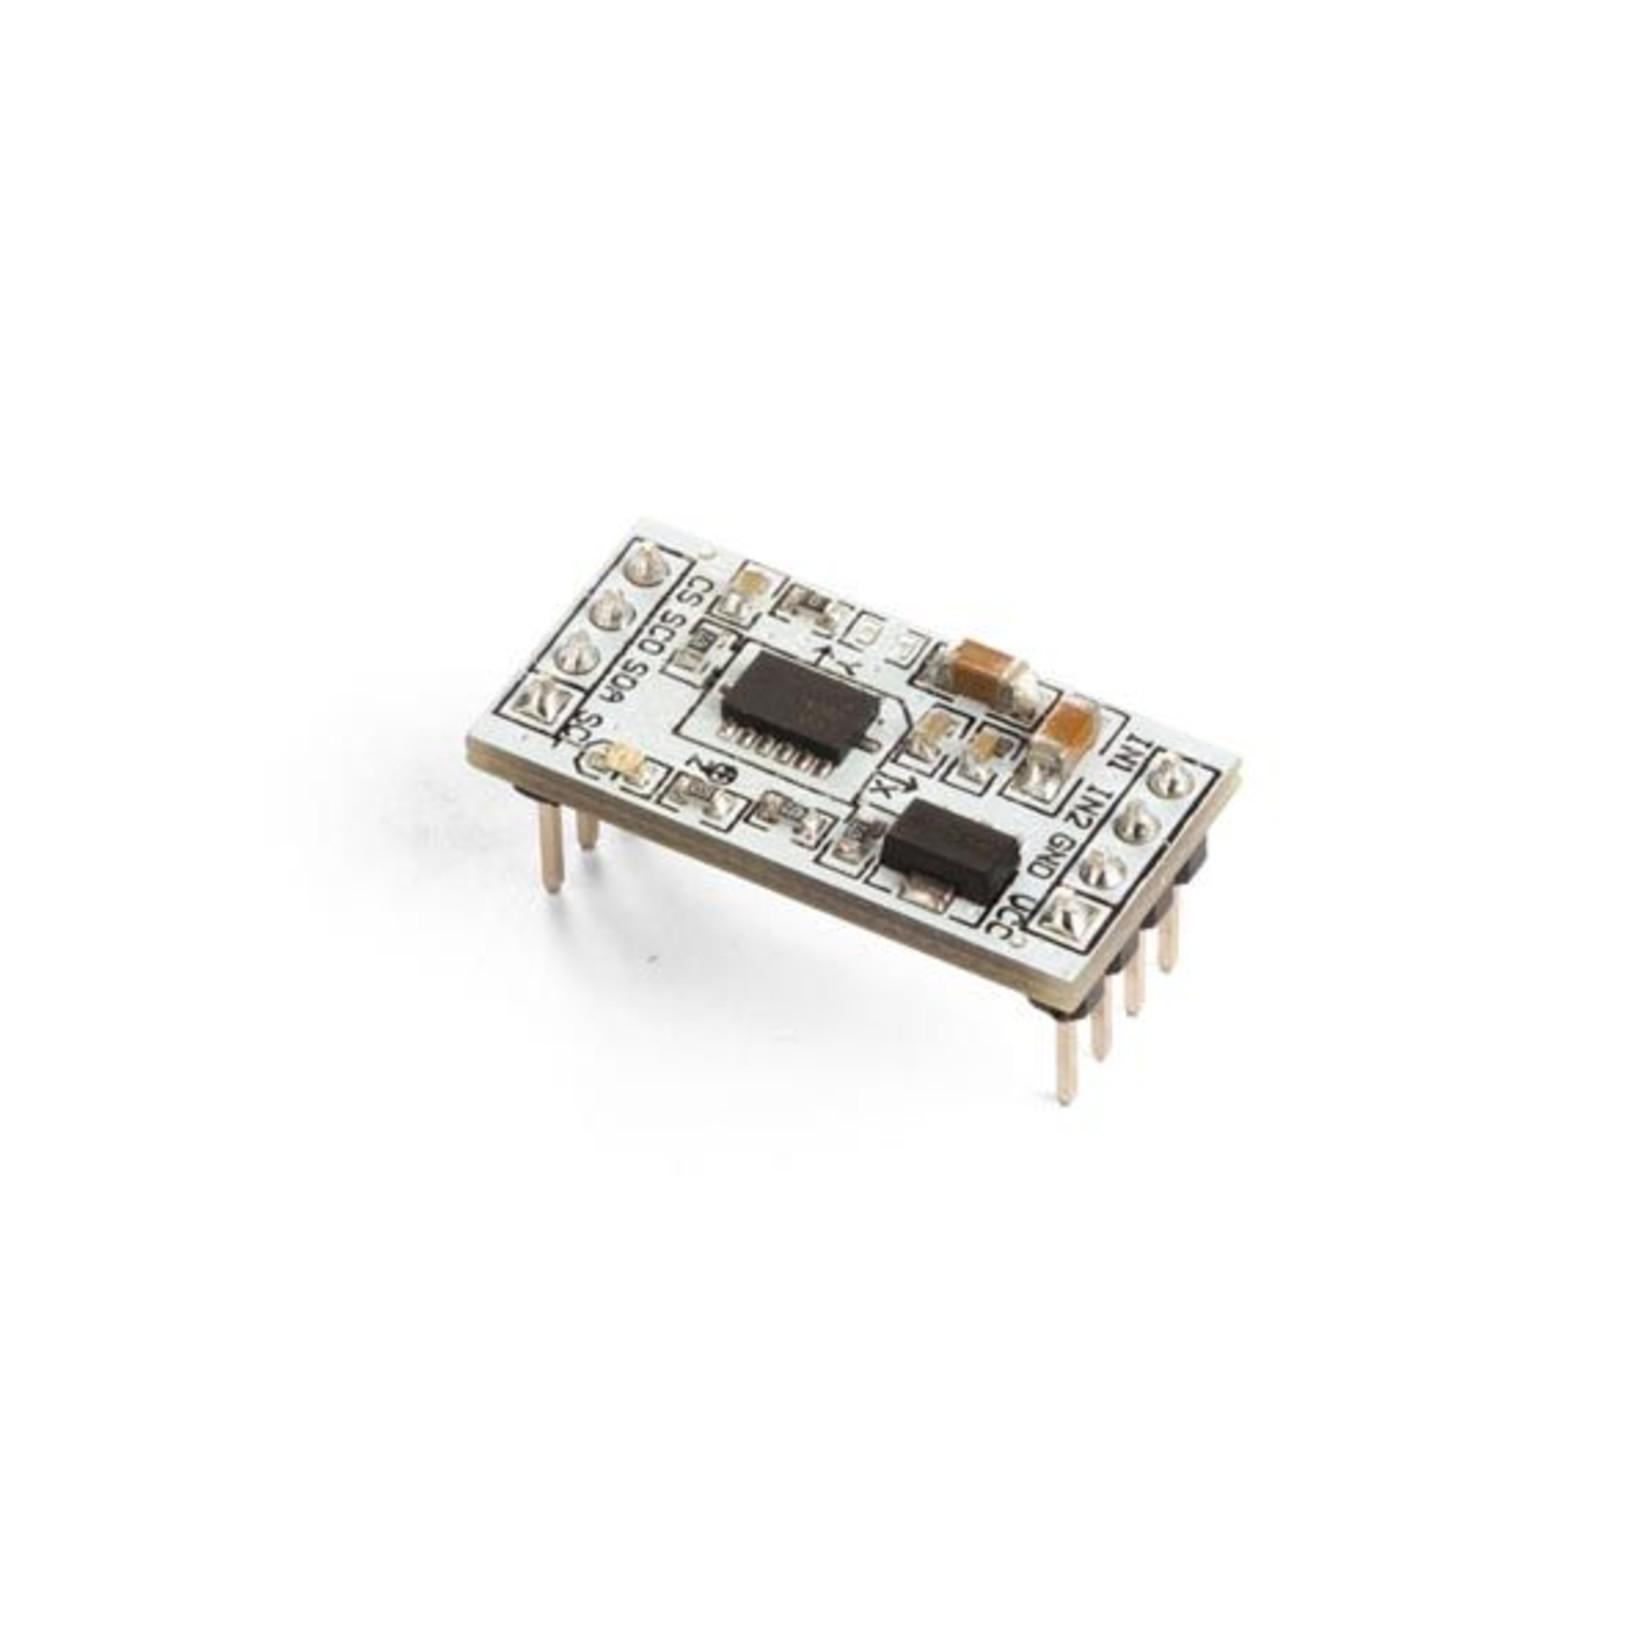 Velleman 3-assige digitale accelerometer - MMA7455